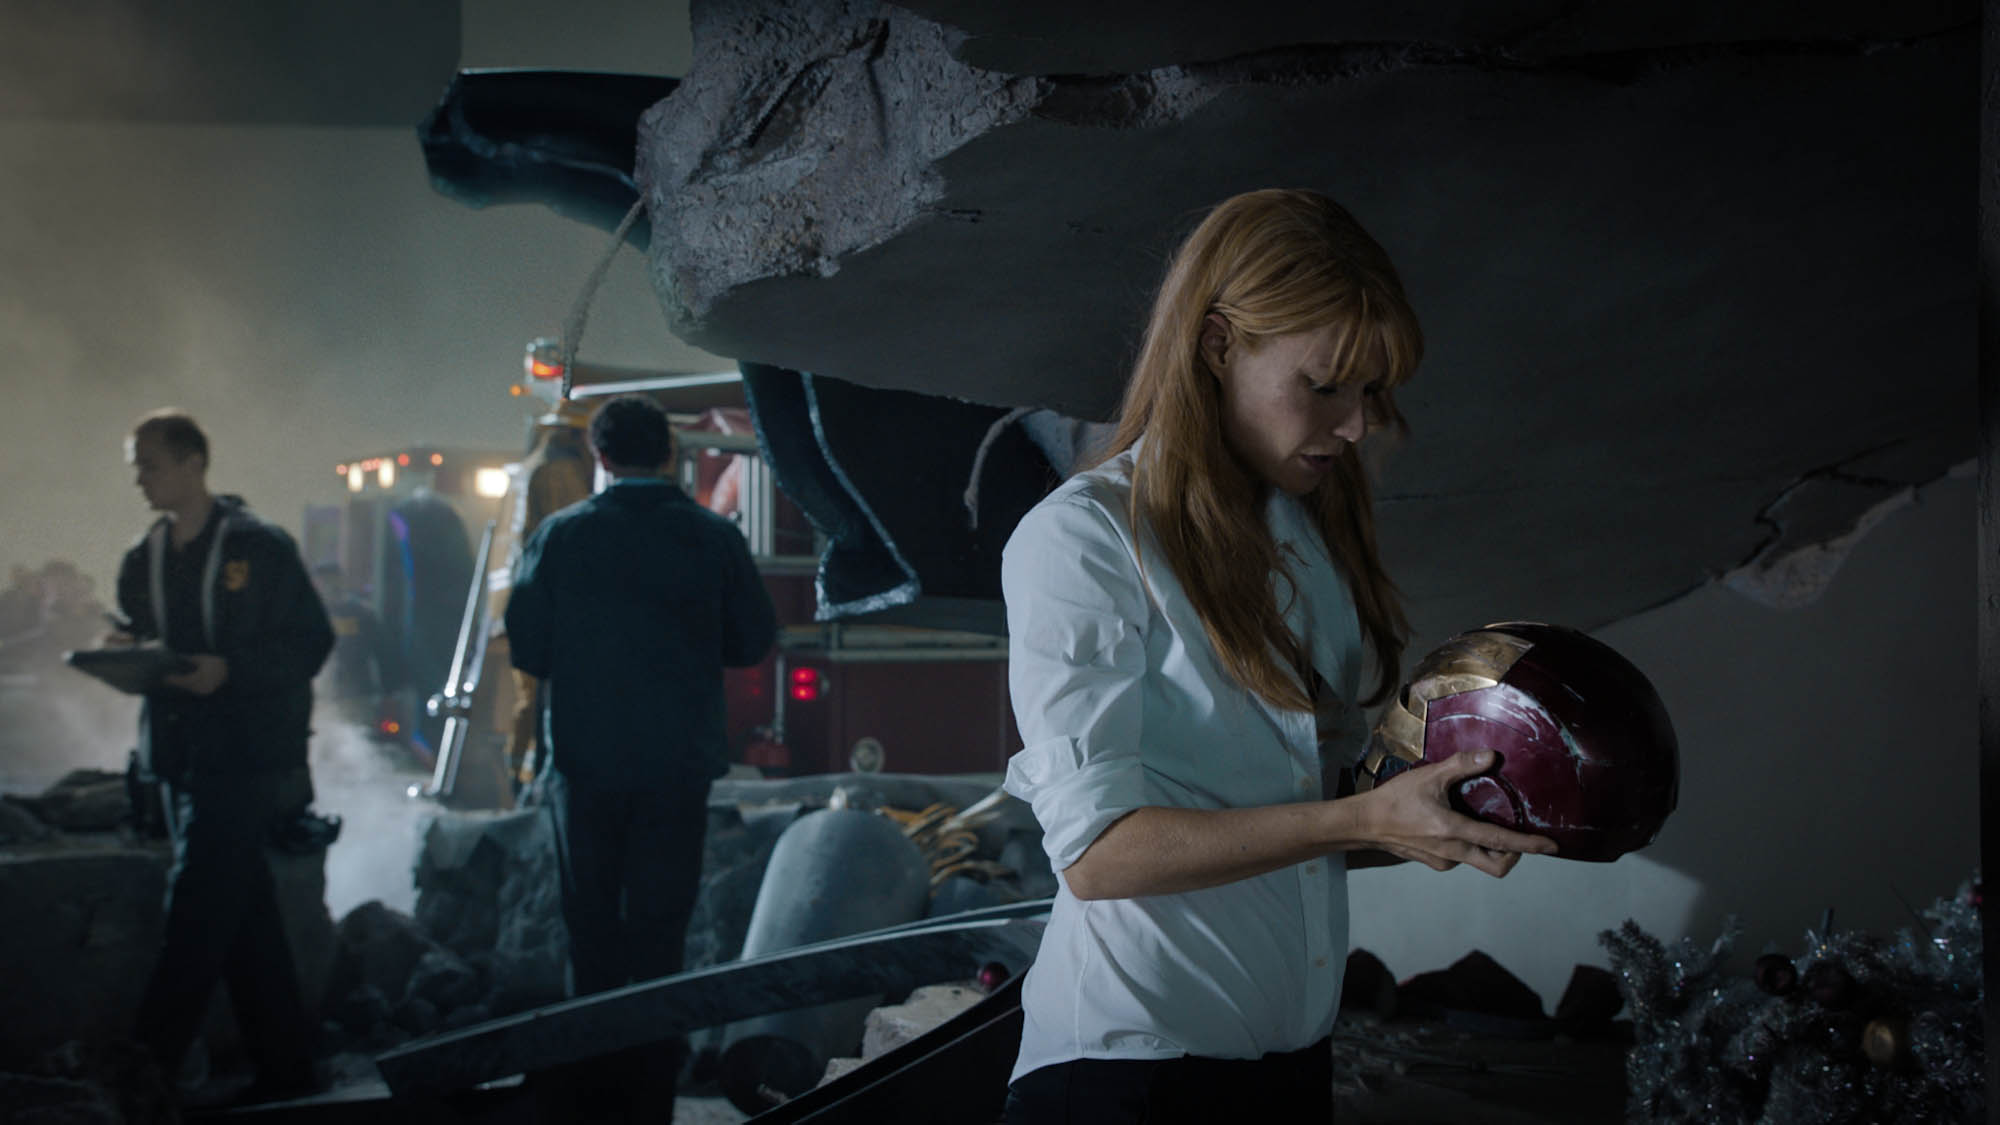 Gwyneth Paltrow as Stark Industries CEO Pepper Potts